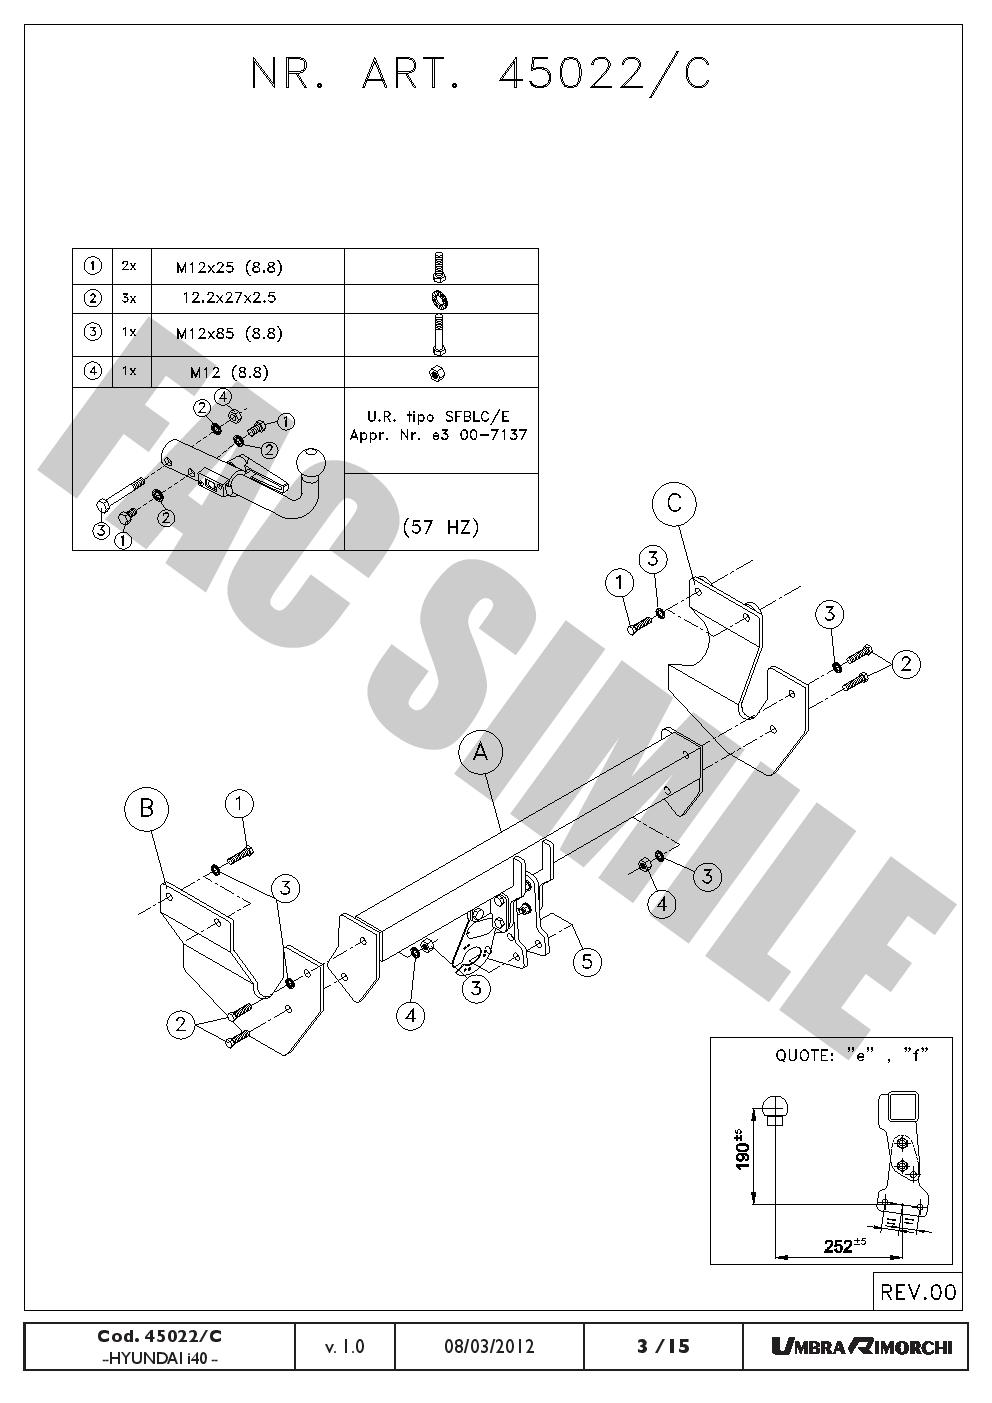 45022/_B1 AHK Abnehmbare Anhängerkupplung 13p C2 E-Satz Hyundai i40 CW 11